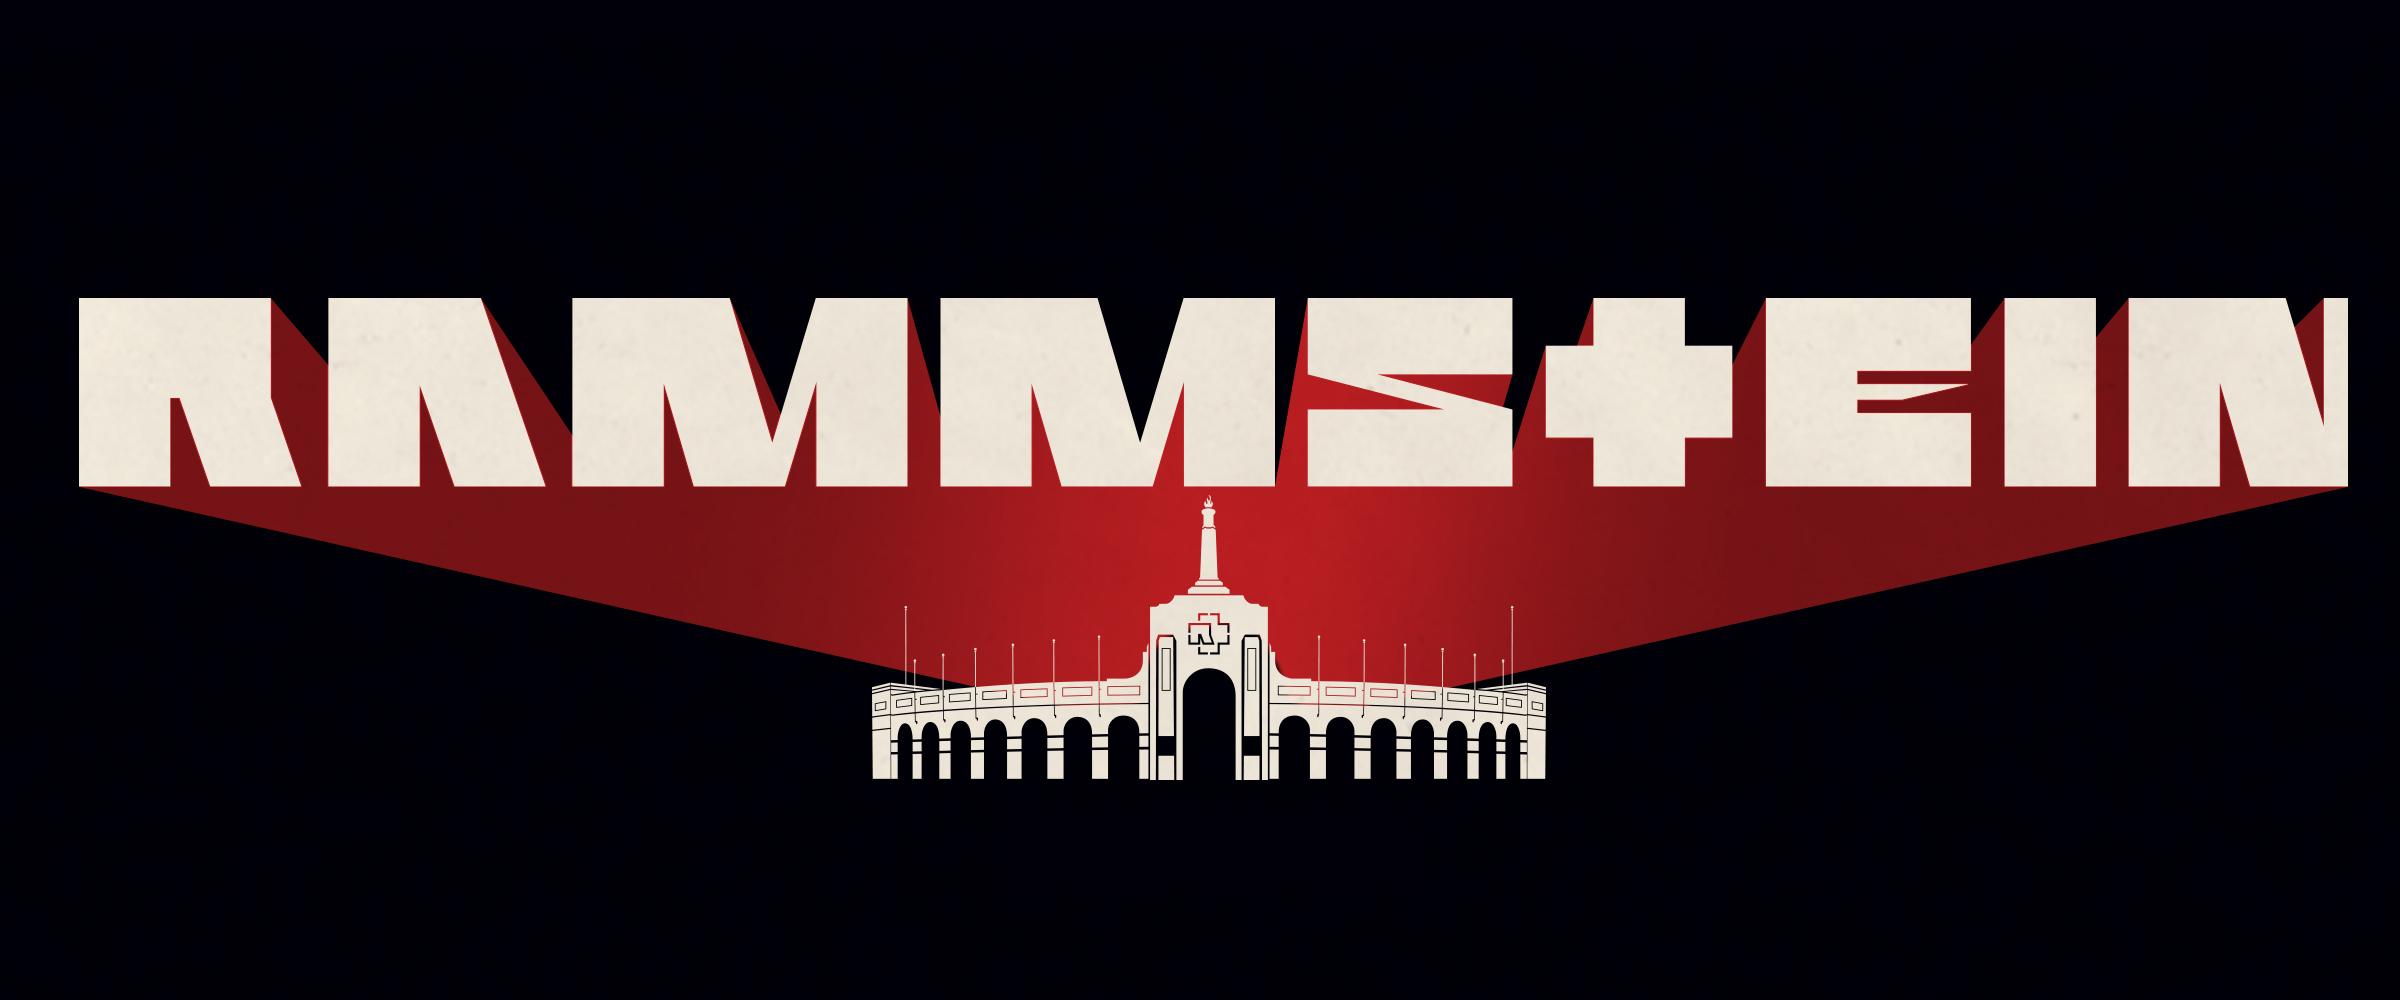 Rammstein (Postponed)